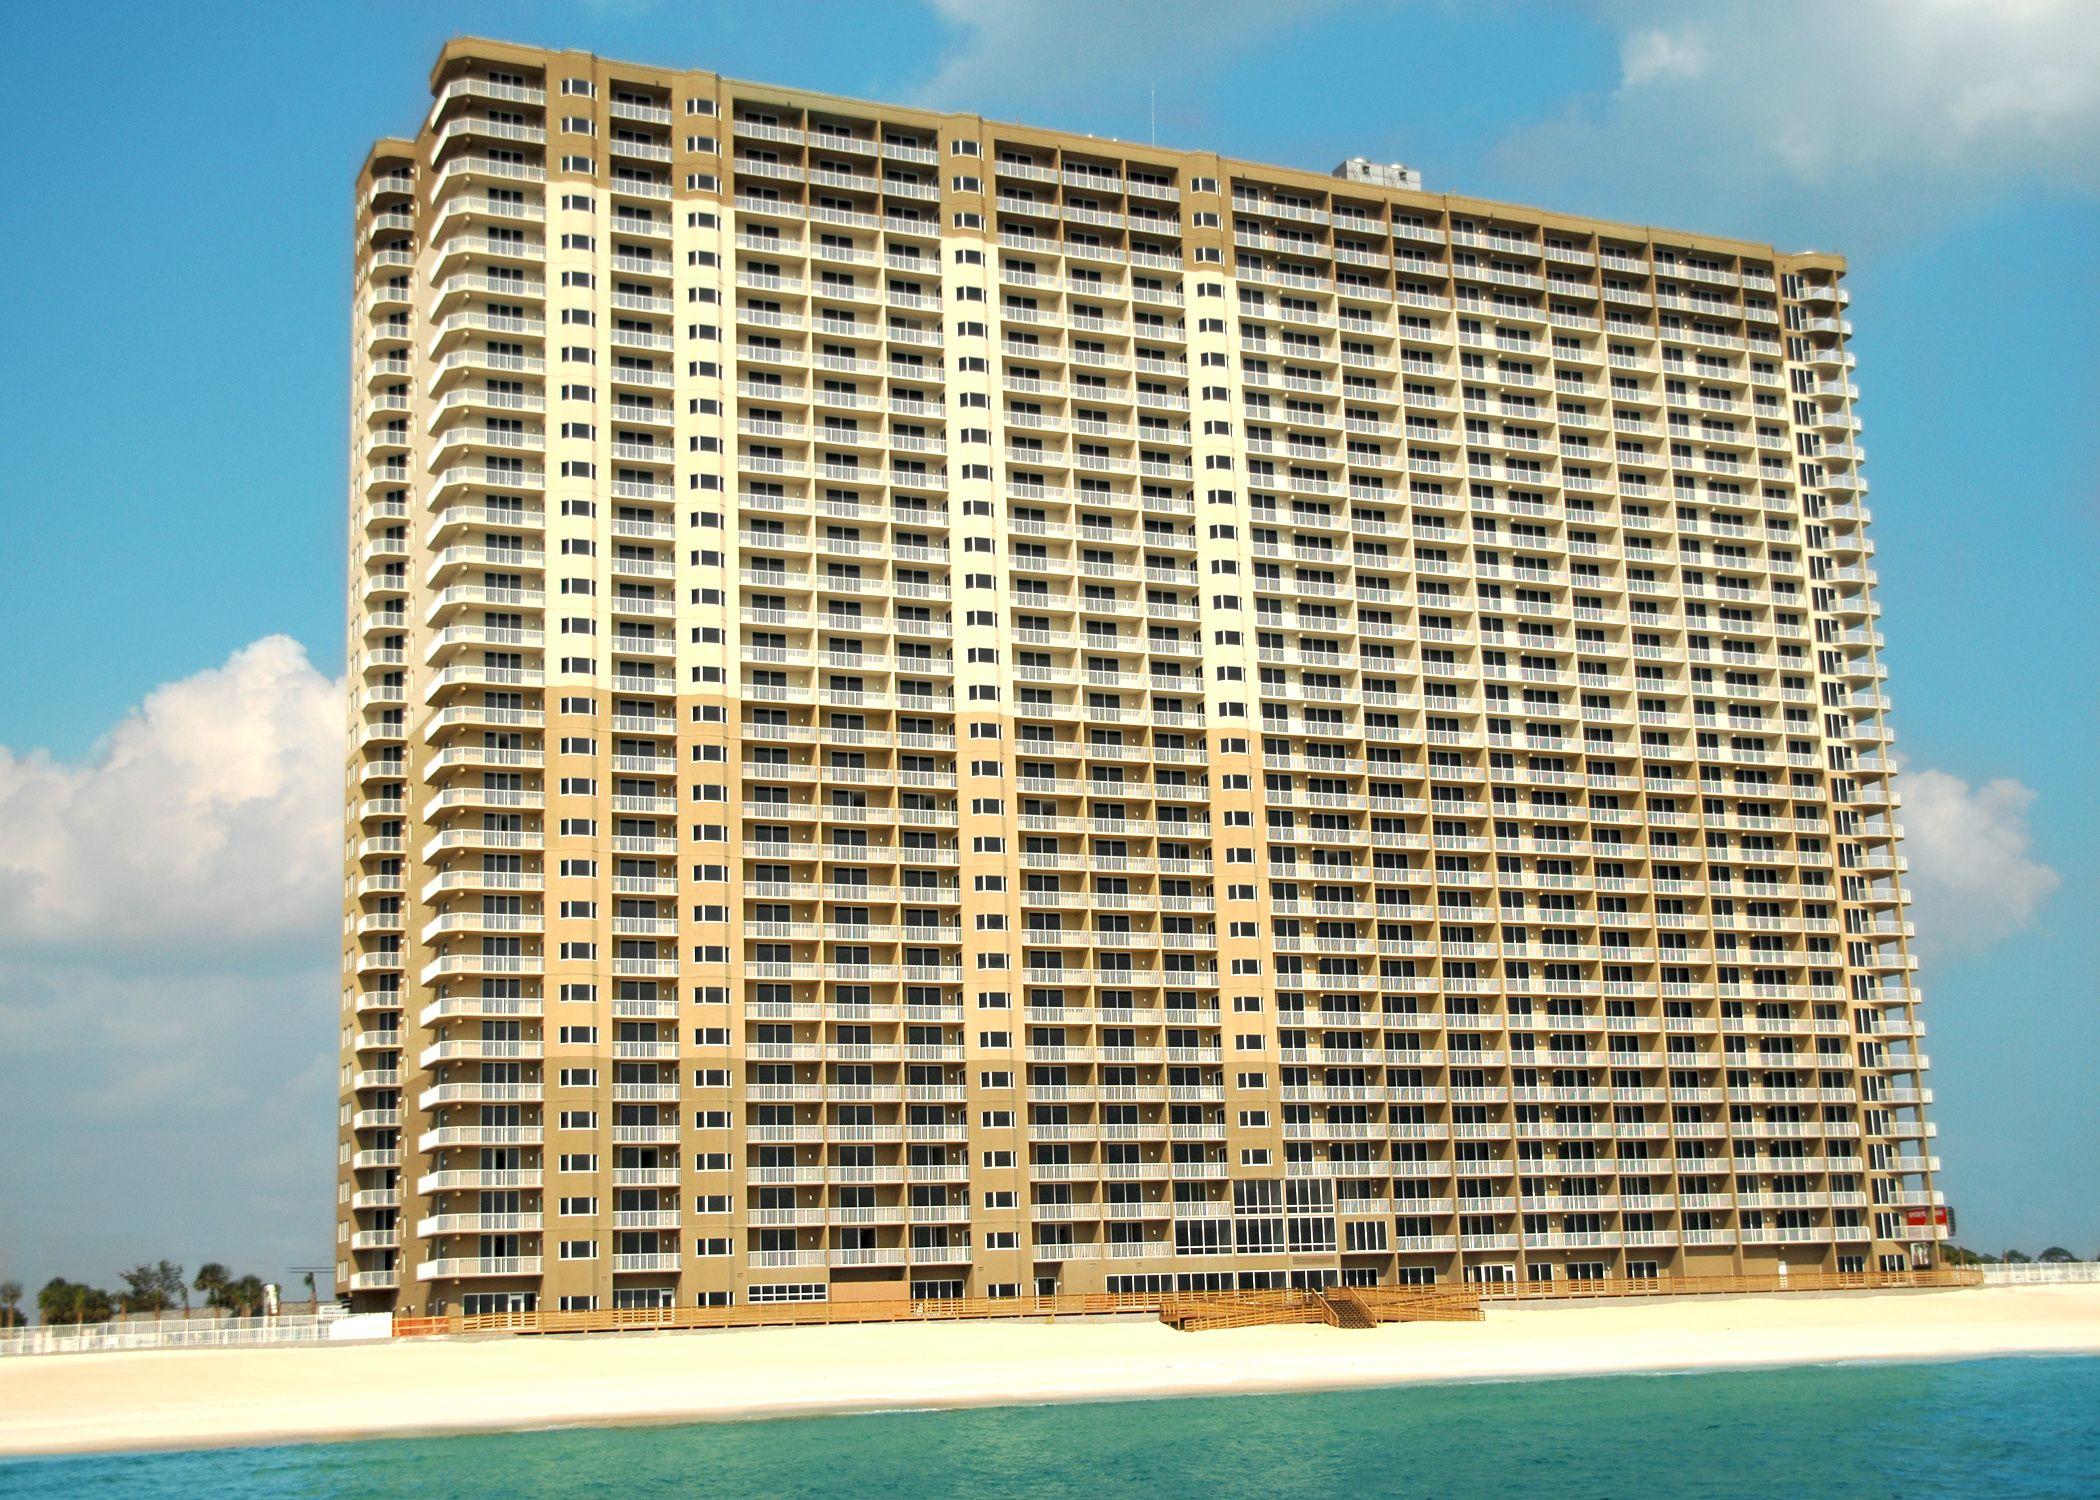 View From Boat Tidewater Pcb Panamacitybeach Panama City Beach Florida Panama City Panama Panama City Beach